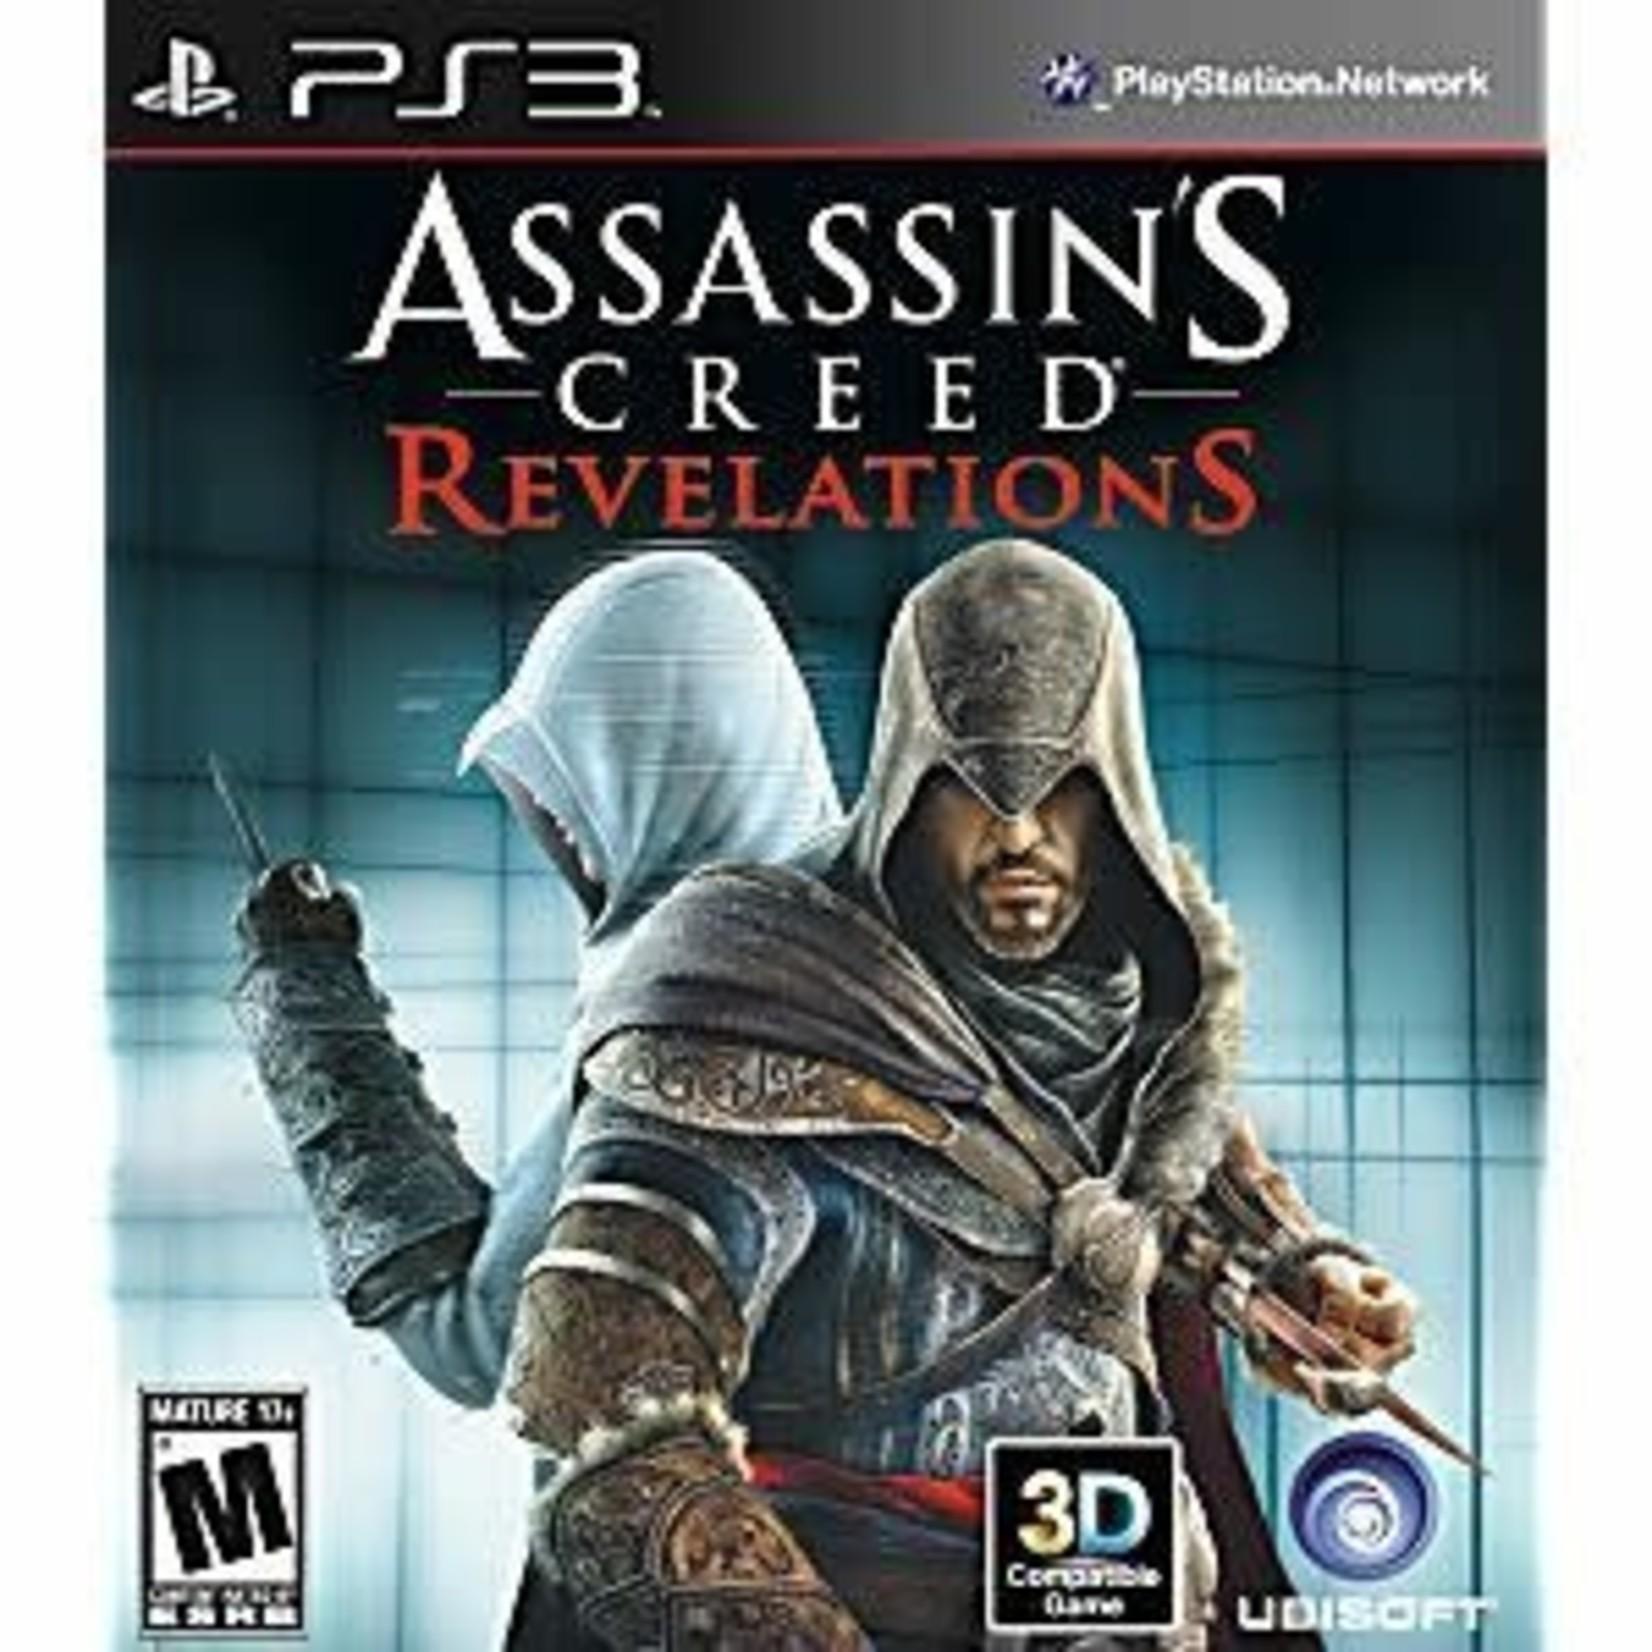 PS3U-Assassin's Creed Revelations